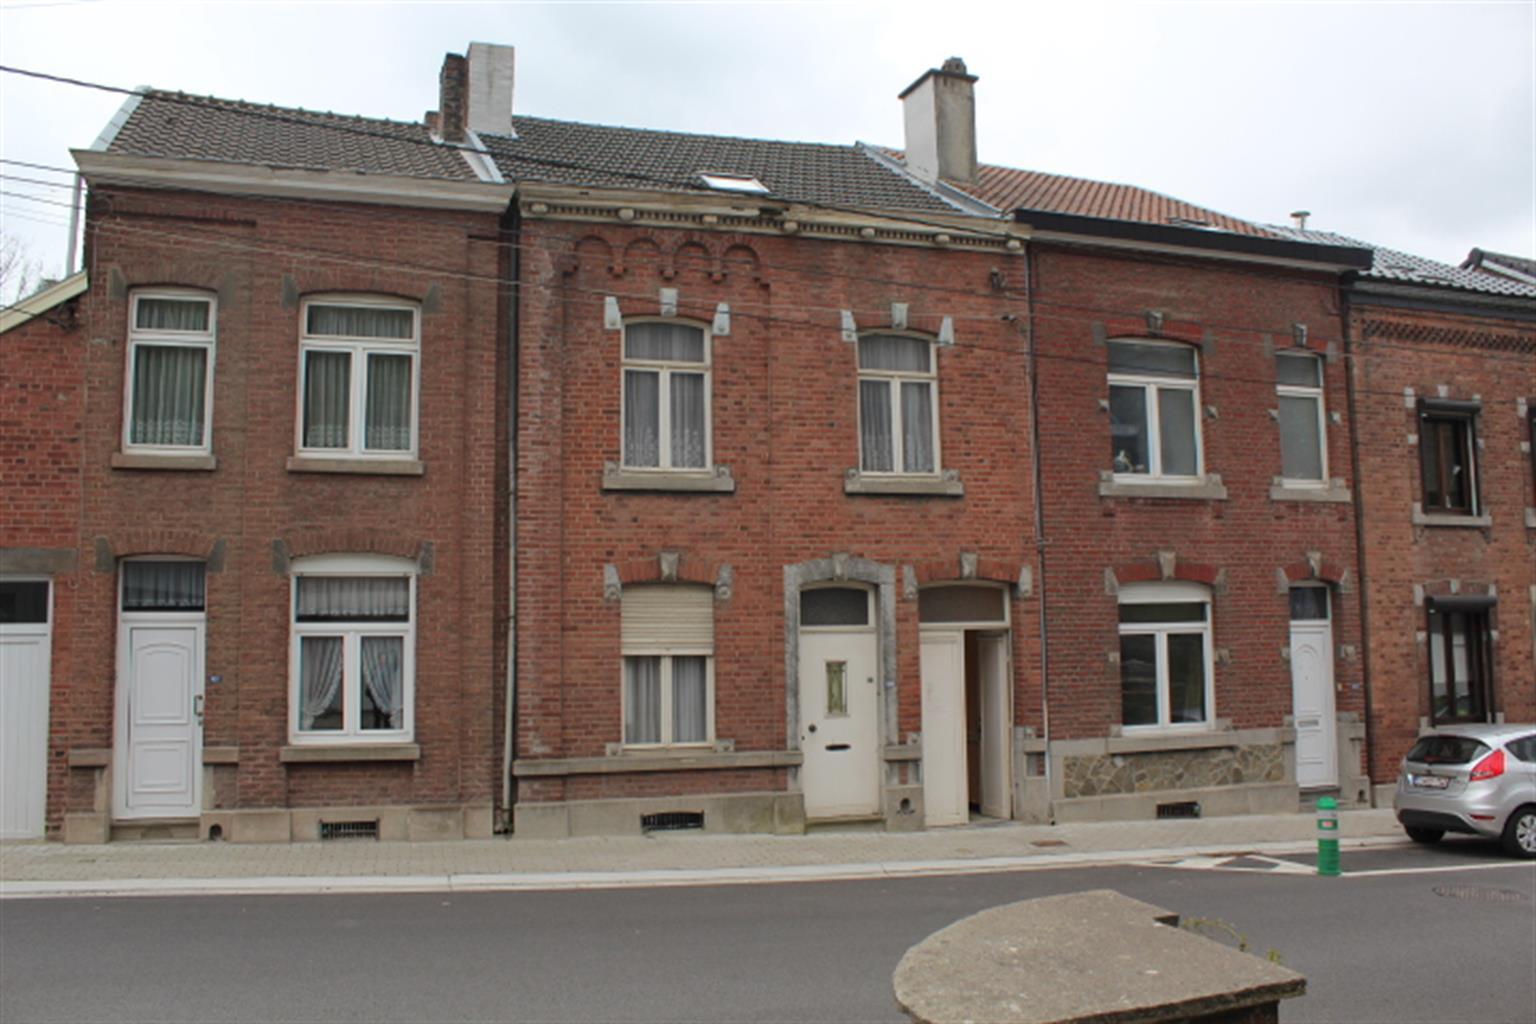 Maison - Beyne-Heusay - #4356145-0